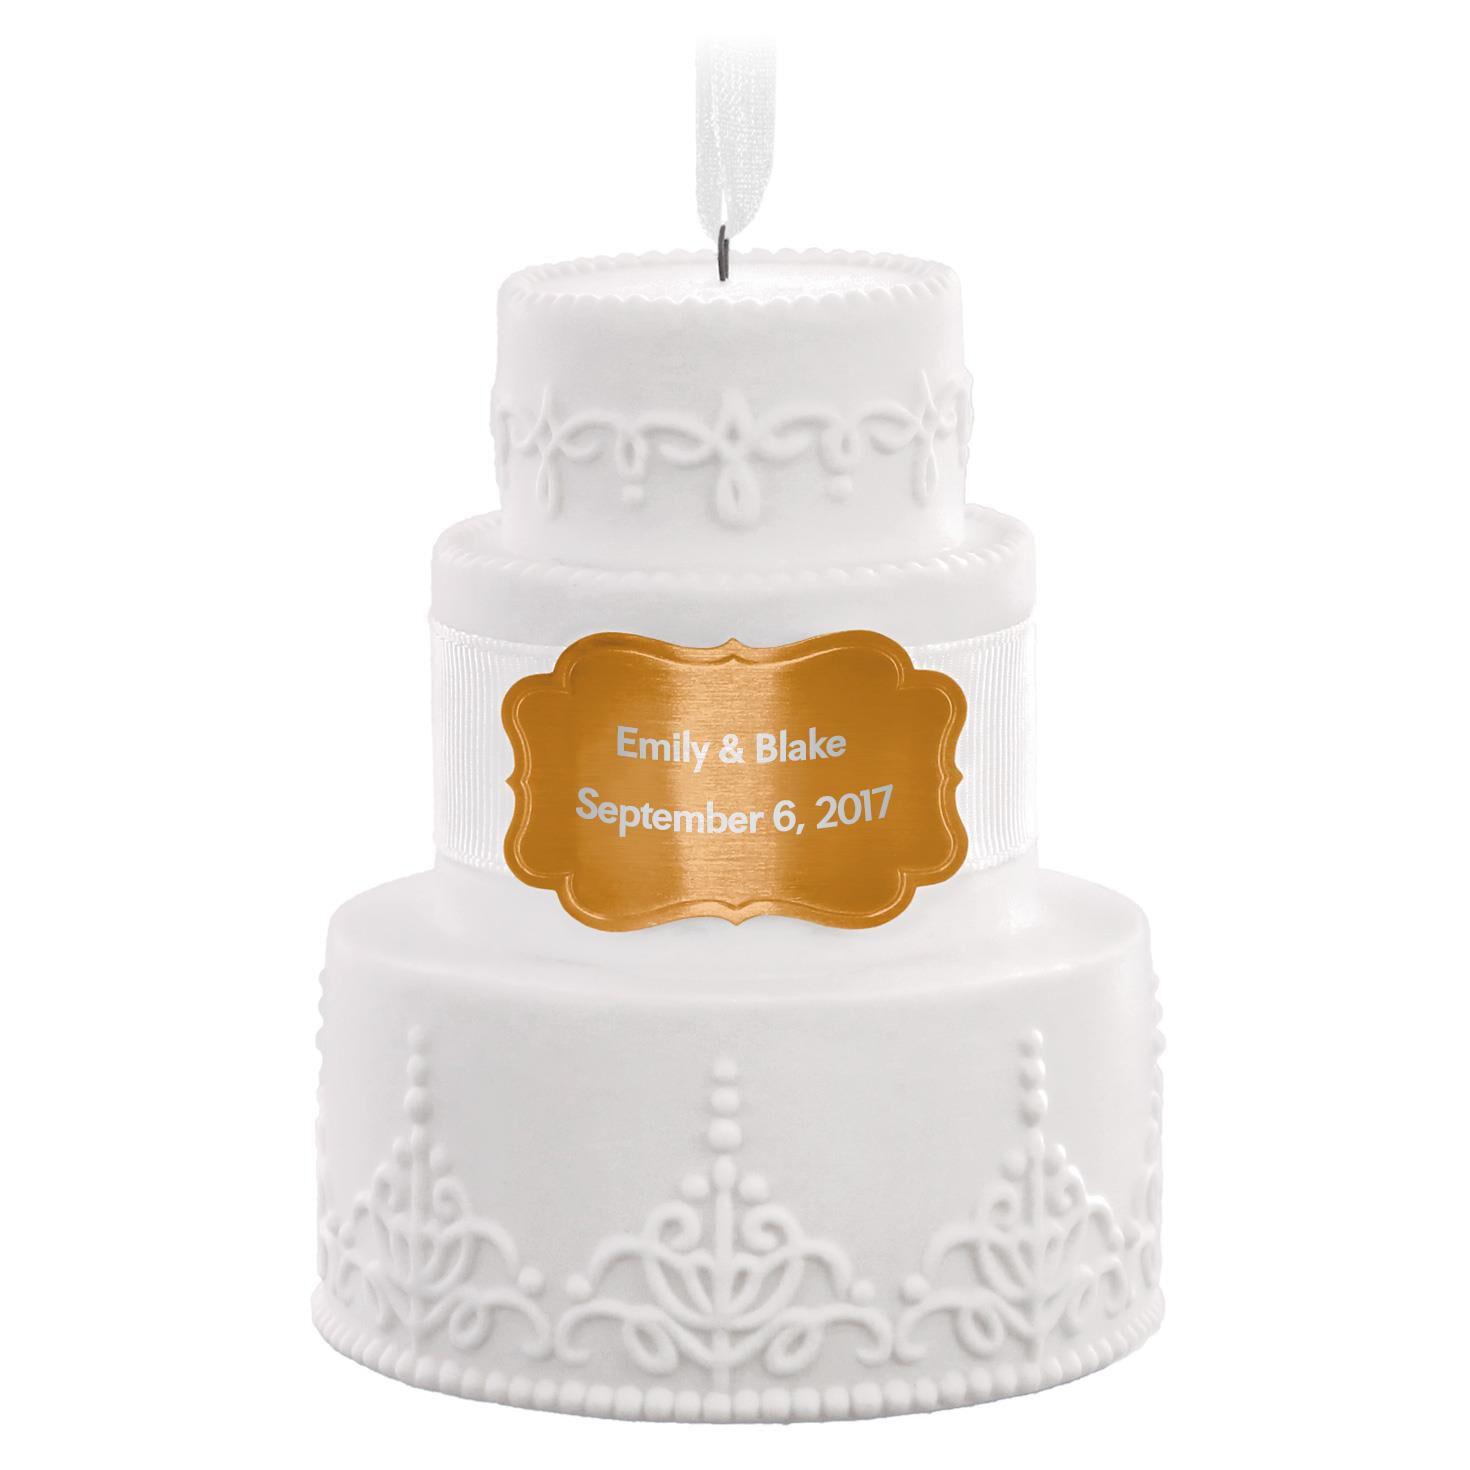 Wedding Cake Personalized Ornament - Personalized Ornaments - Hallmark